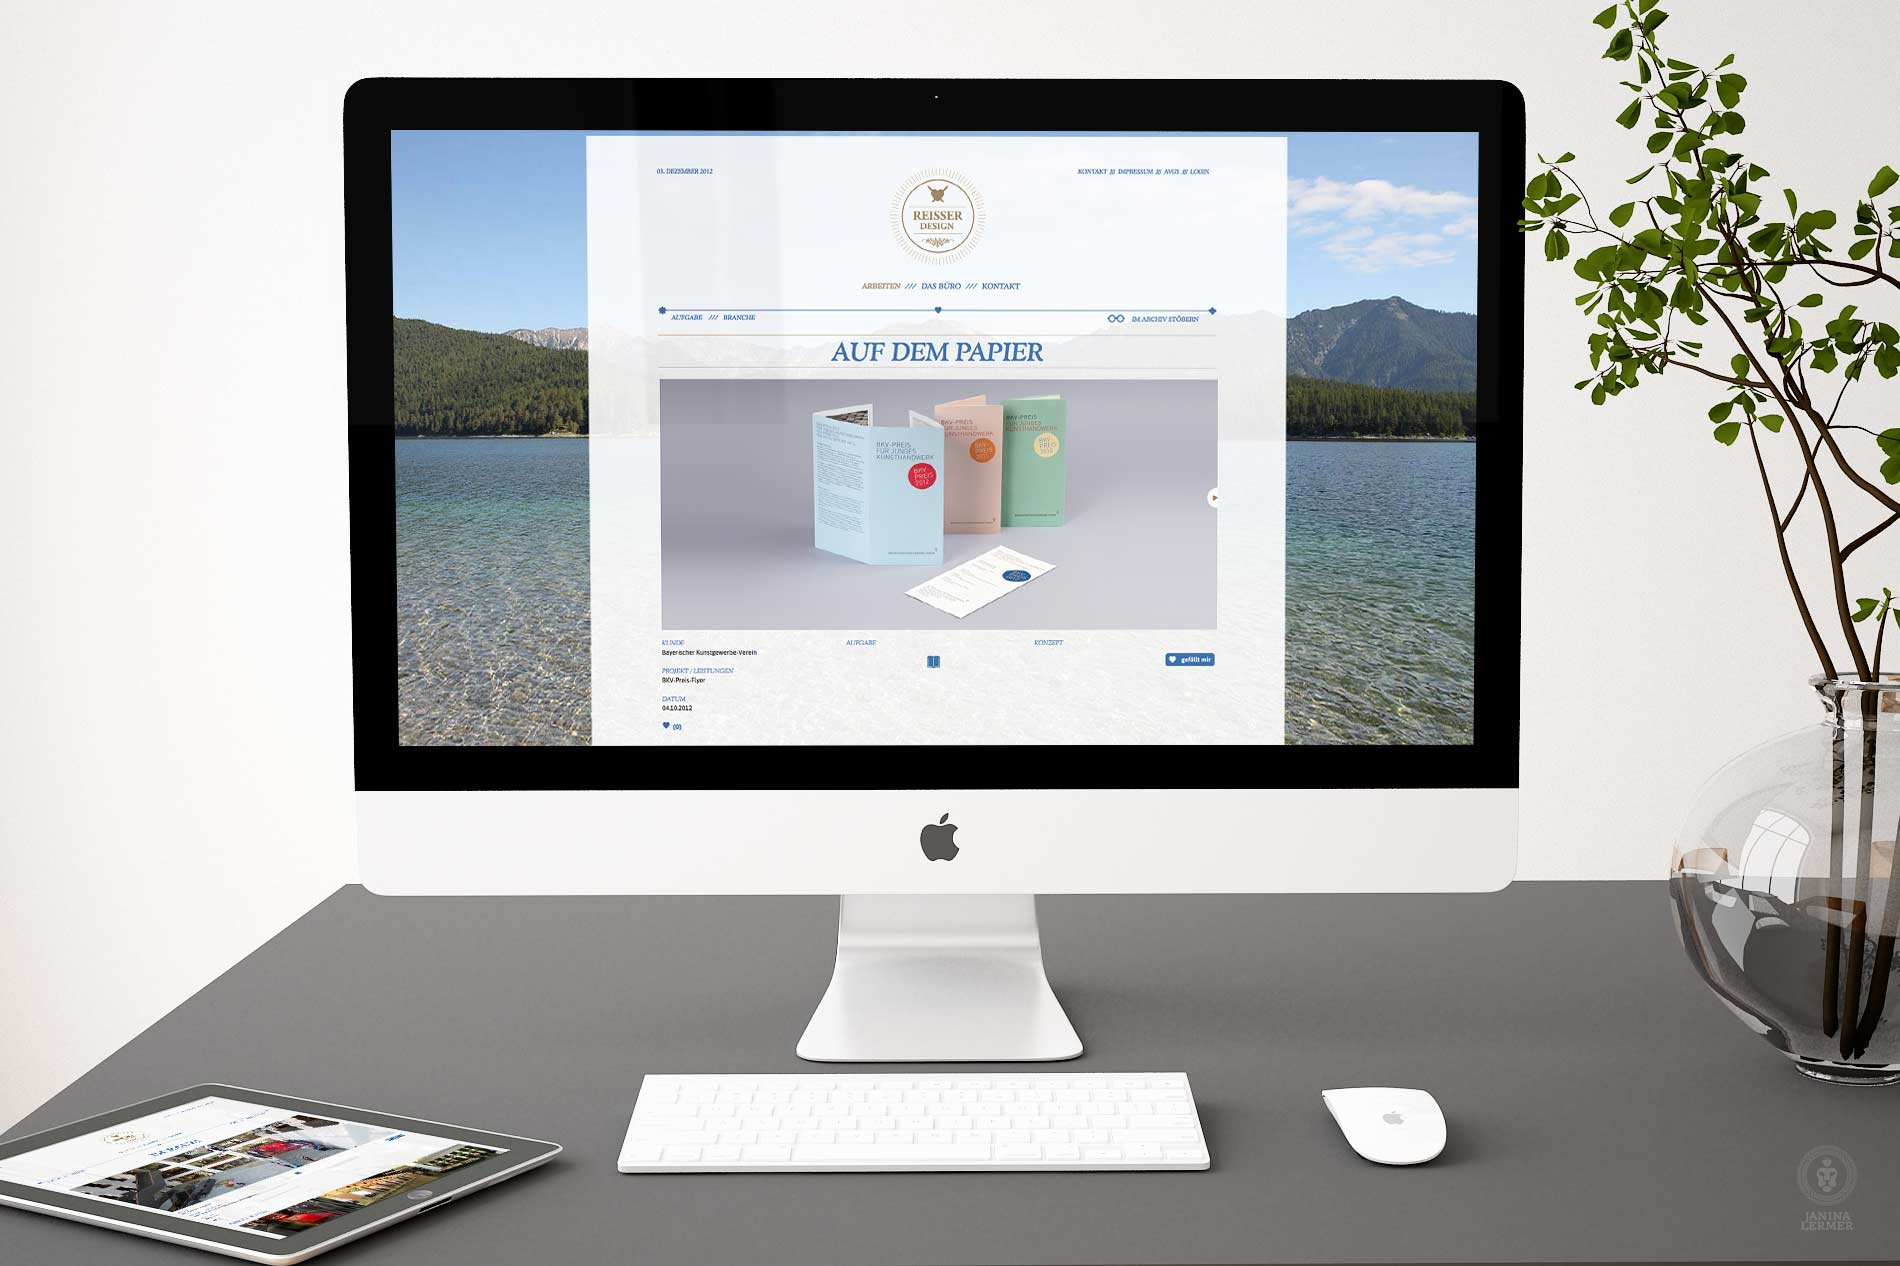 Janina-Lermer-Webseitenkonzept-Webseitengestaltung-Webdesign-Reisserdesign-Projekte-Projects-Papier-Paper-Detail